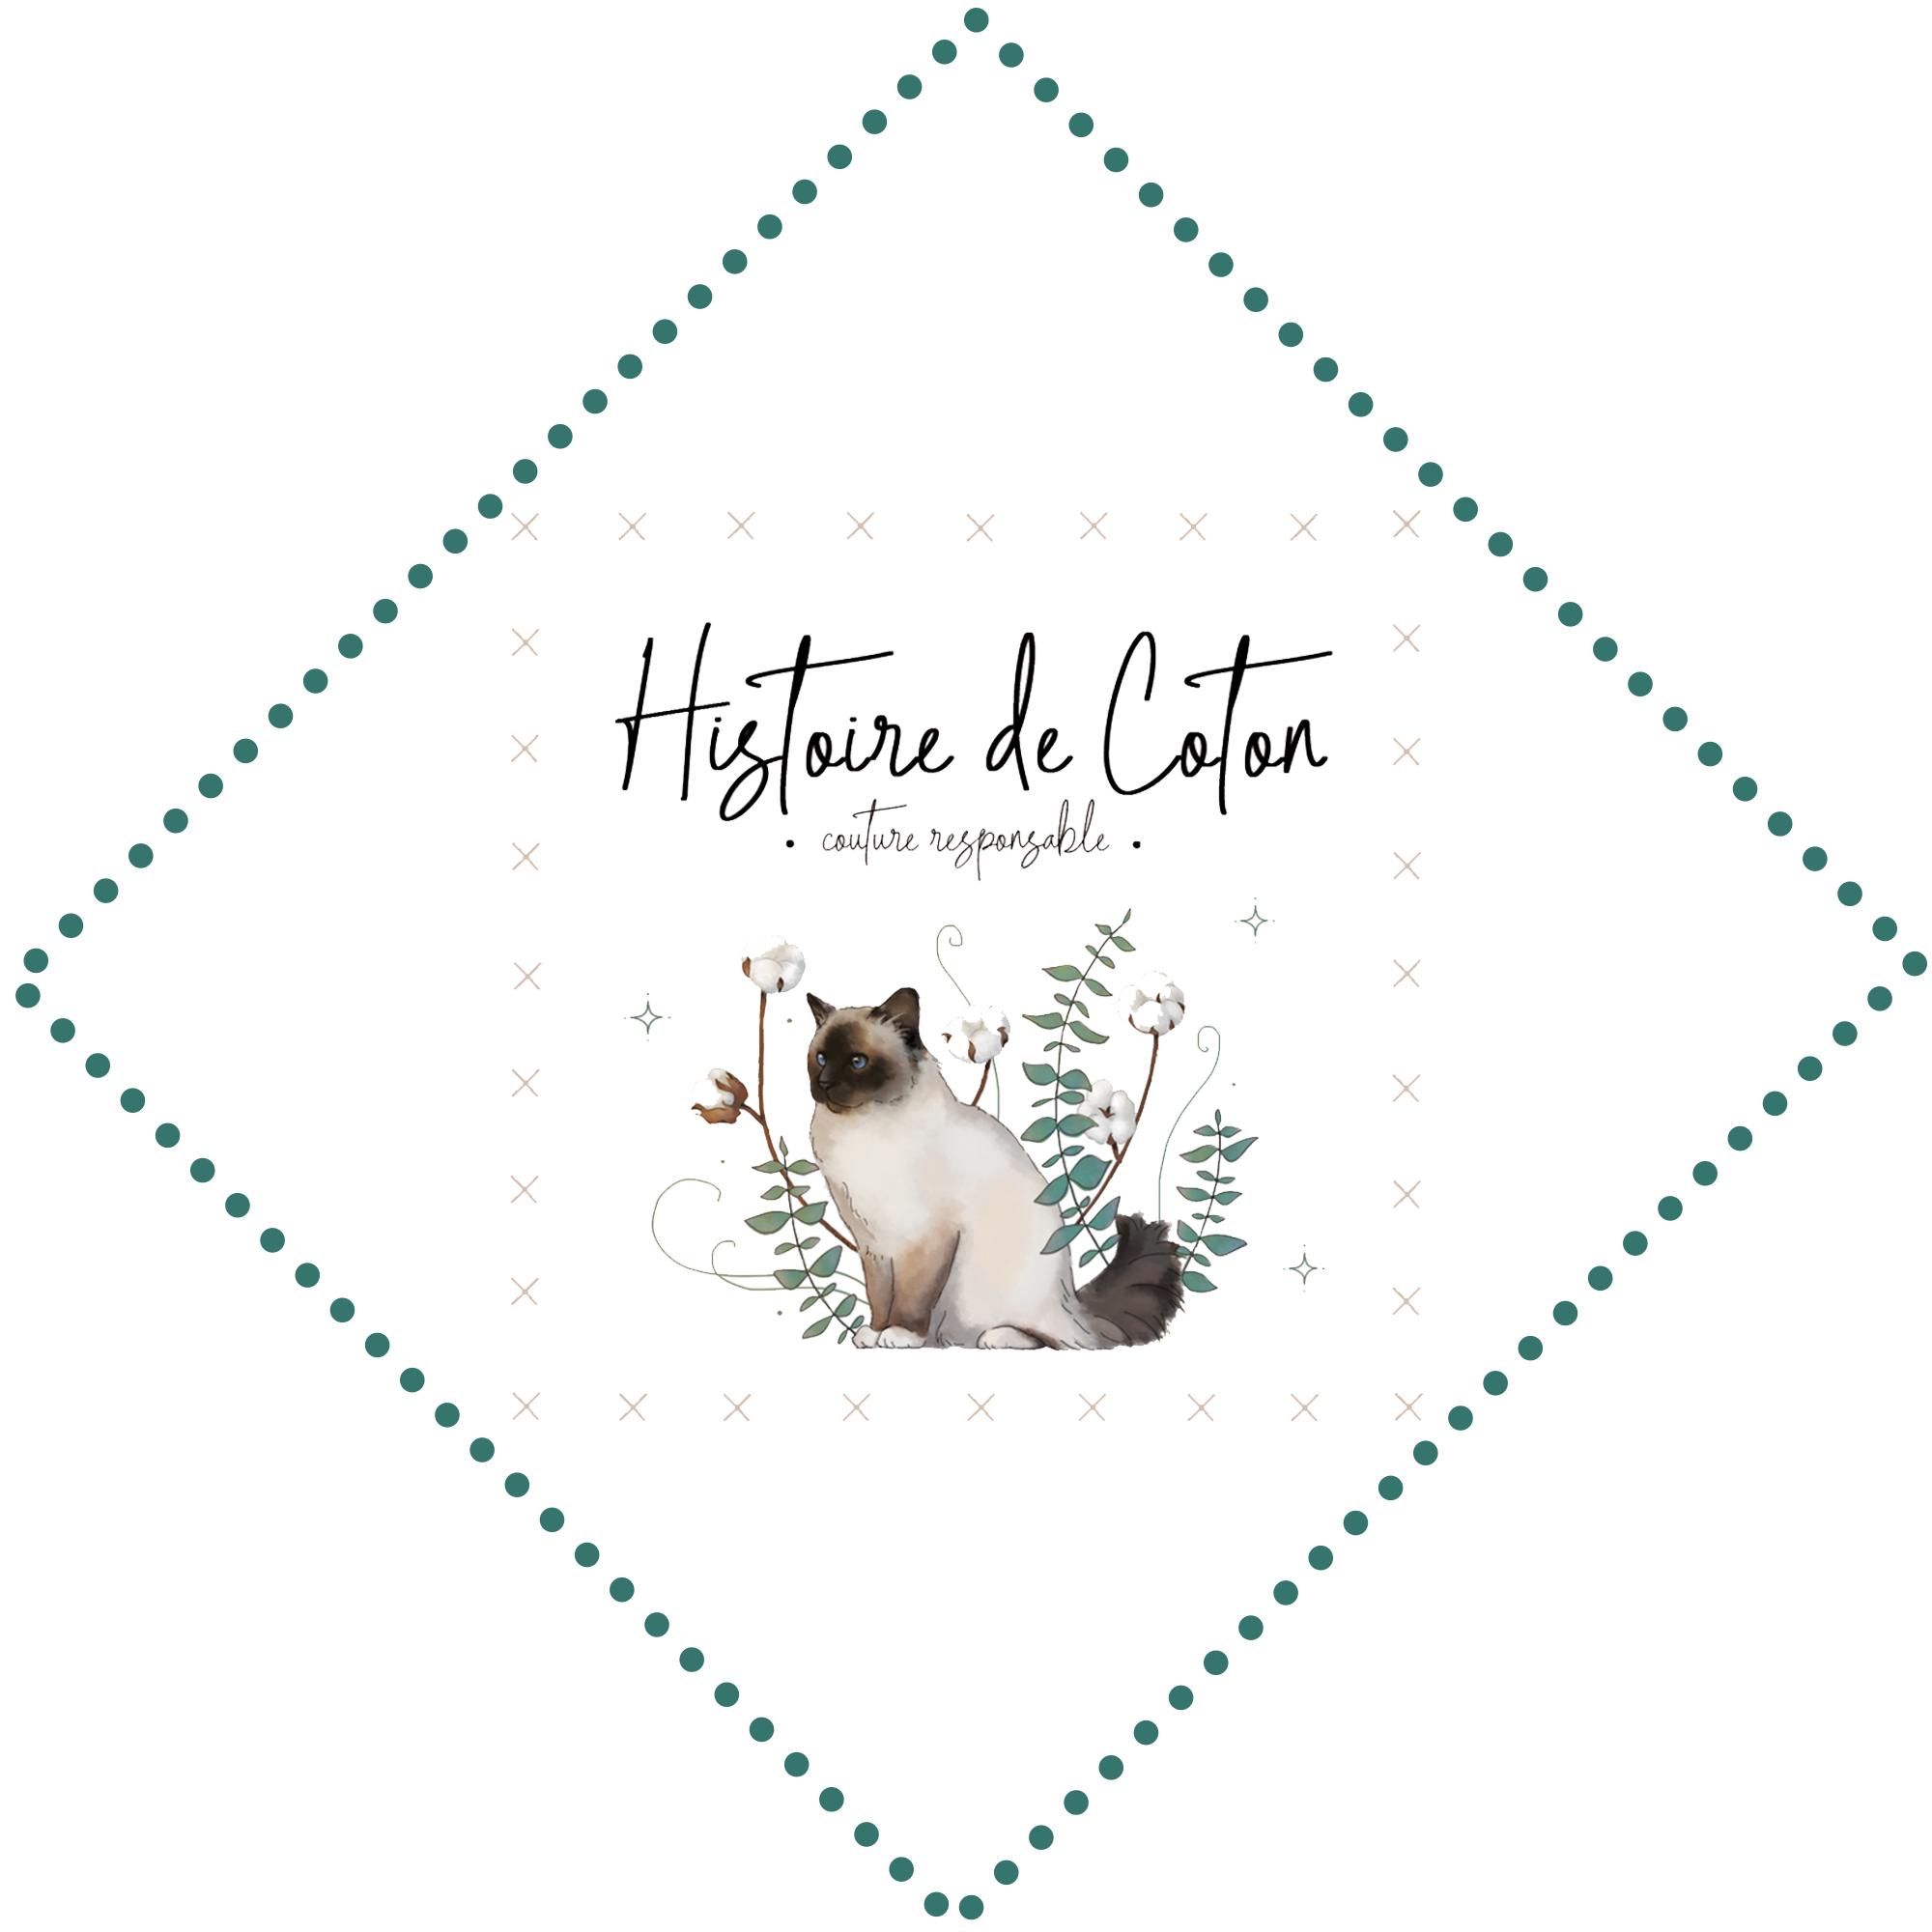 HISTOIRE DE COTON